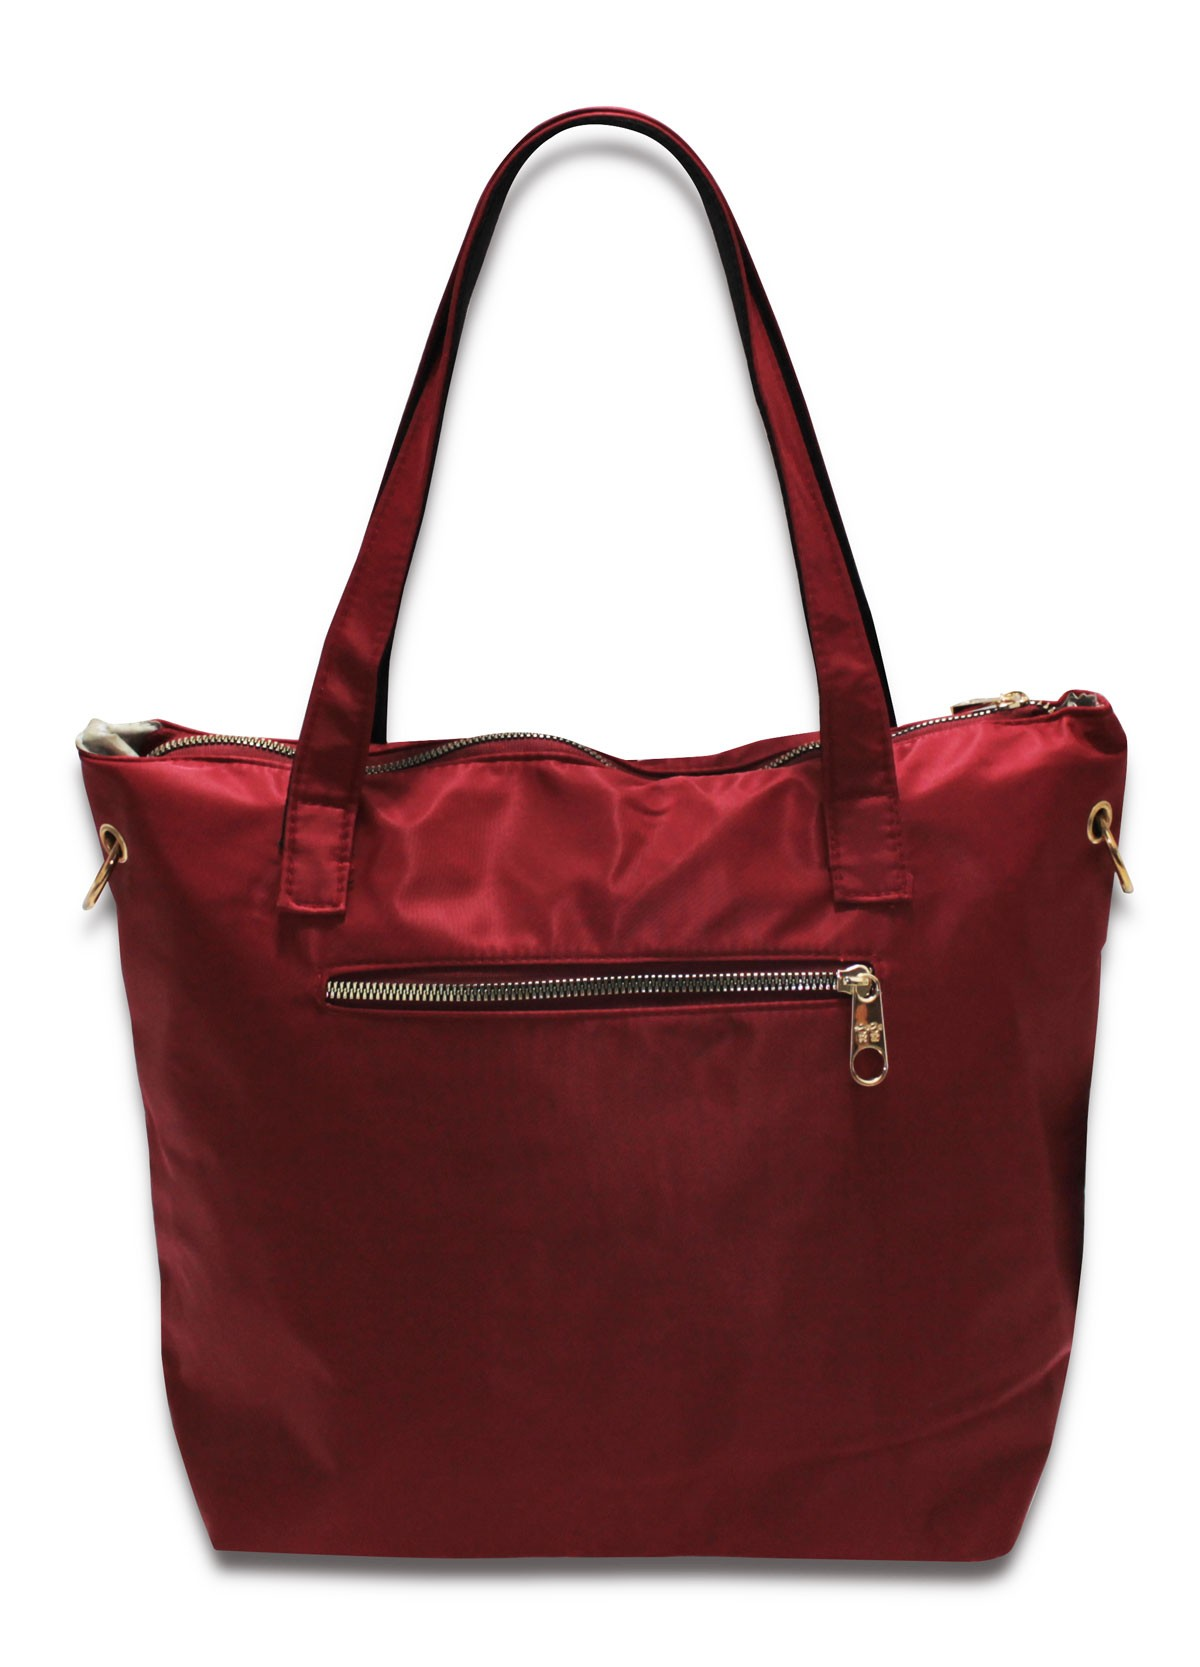 Bolsa Feminina Shopper Transversal M1907  - Menino_Menina